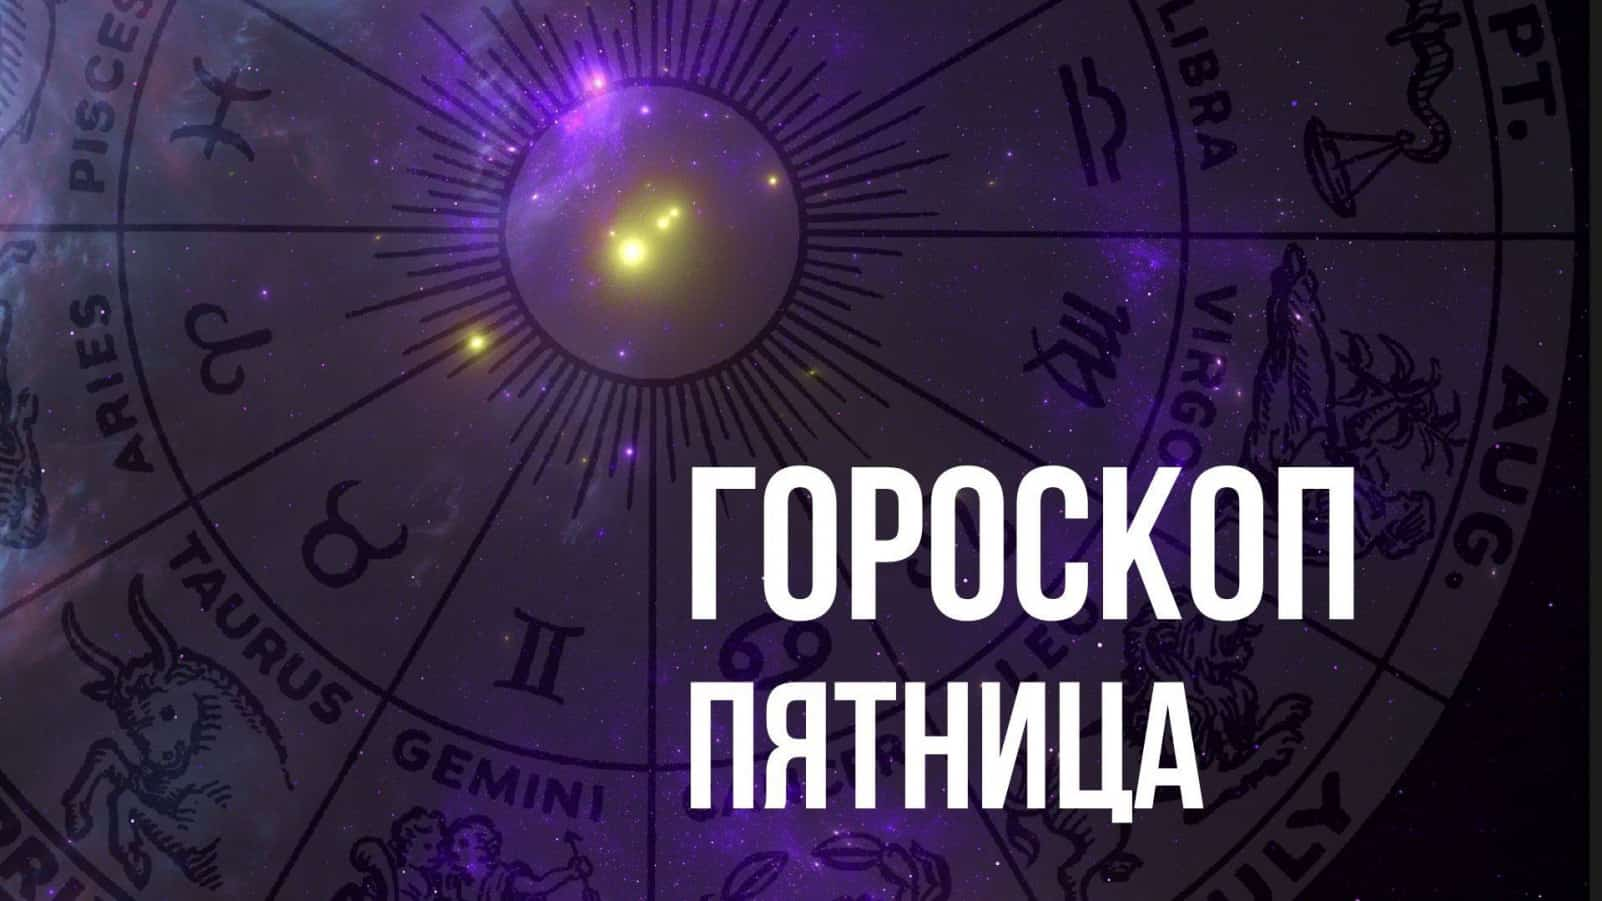 Гороскоп на пятницу 18 марта для каждого знака Зодиака